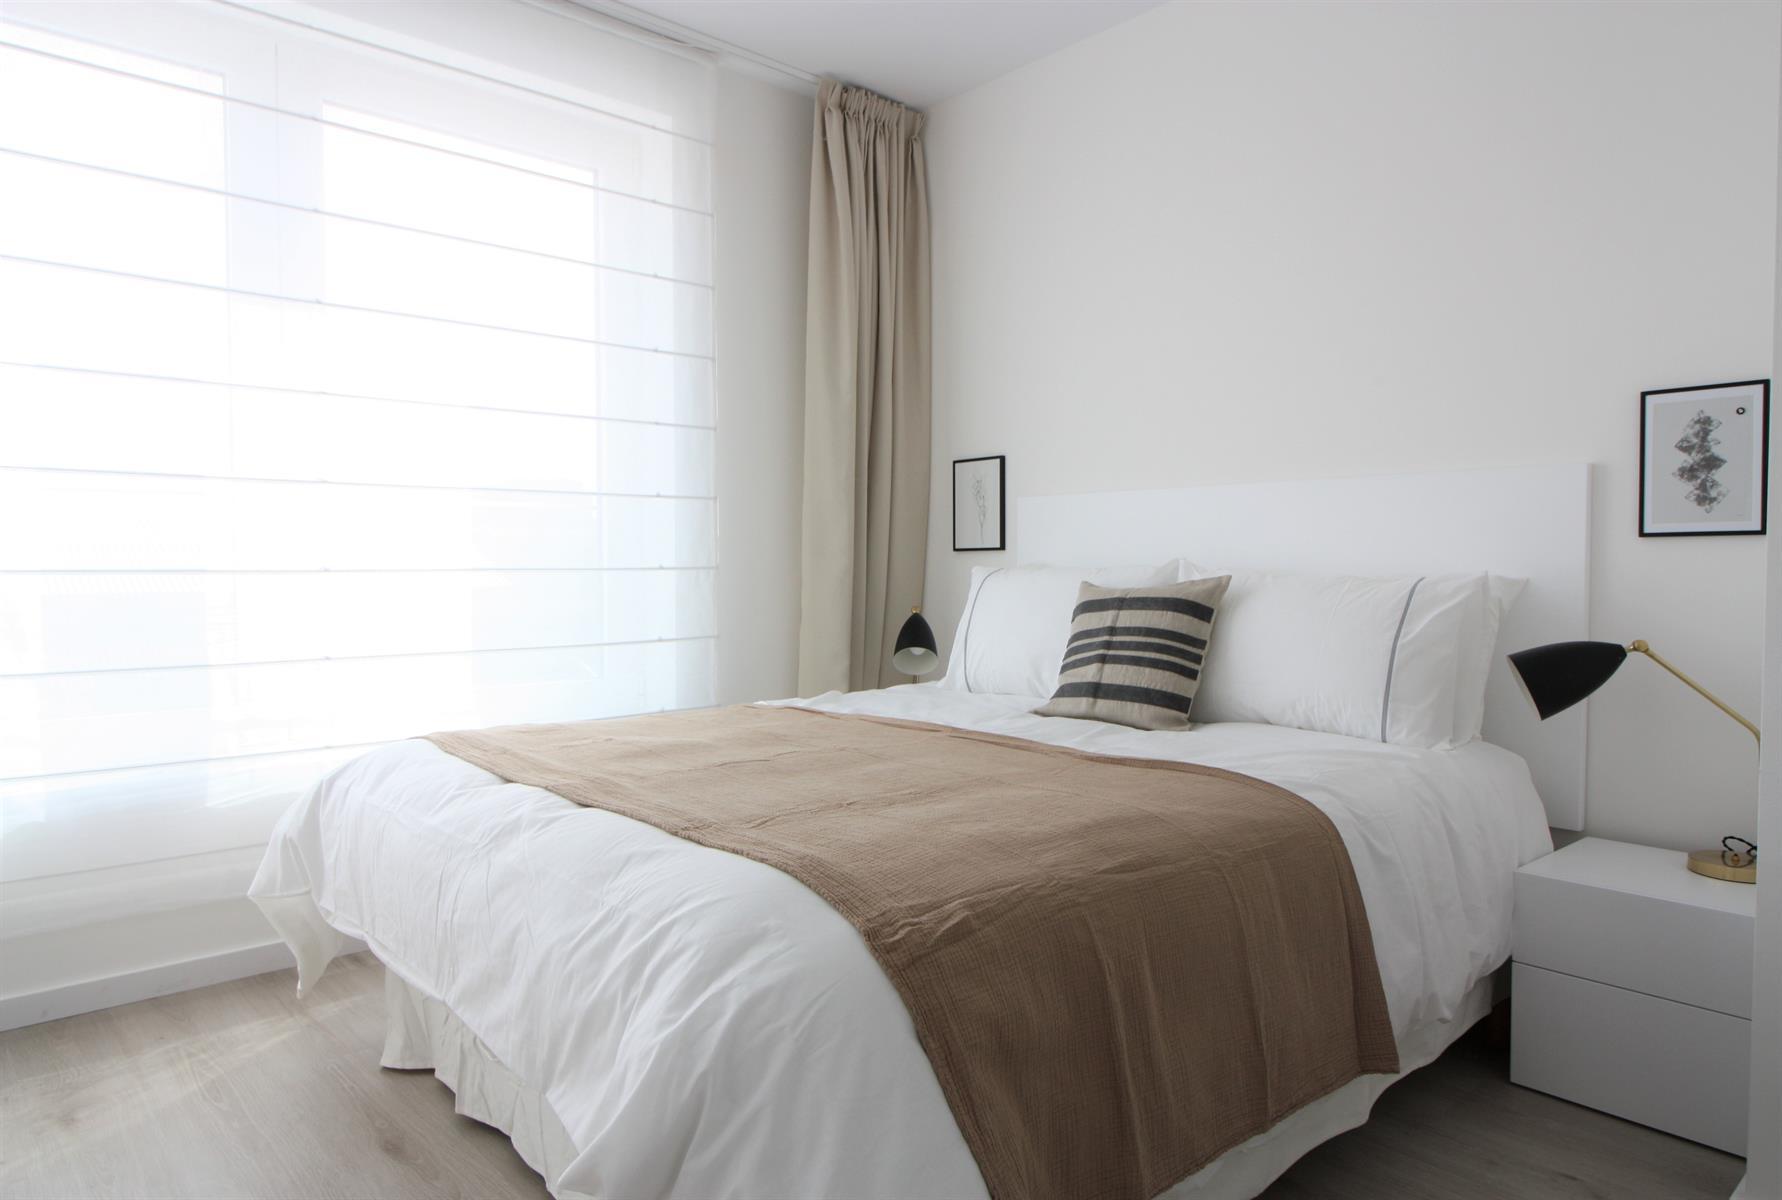 Appartement - Woluwe-Saint-Lambert - #4395355-21